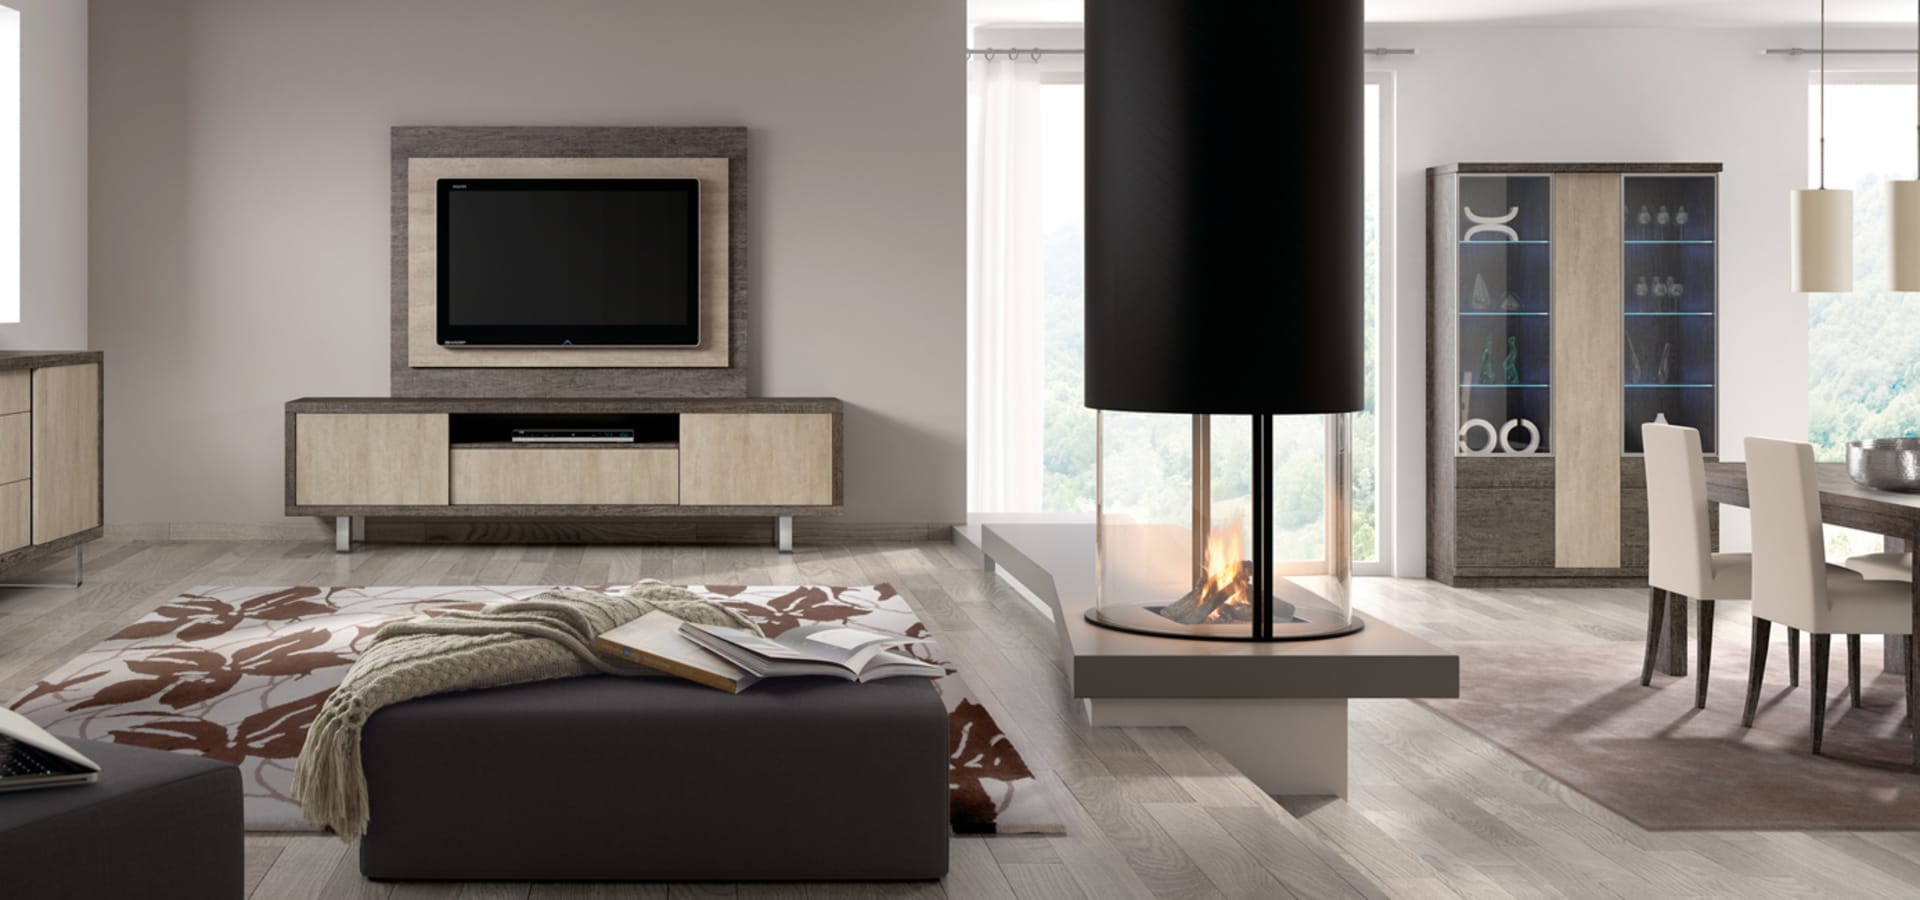 Baixmoduls Furniture Accessories In Castellbisbal Barcelona  # Muebles Baixmoduls